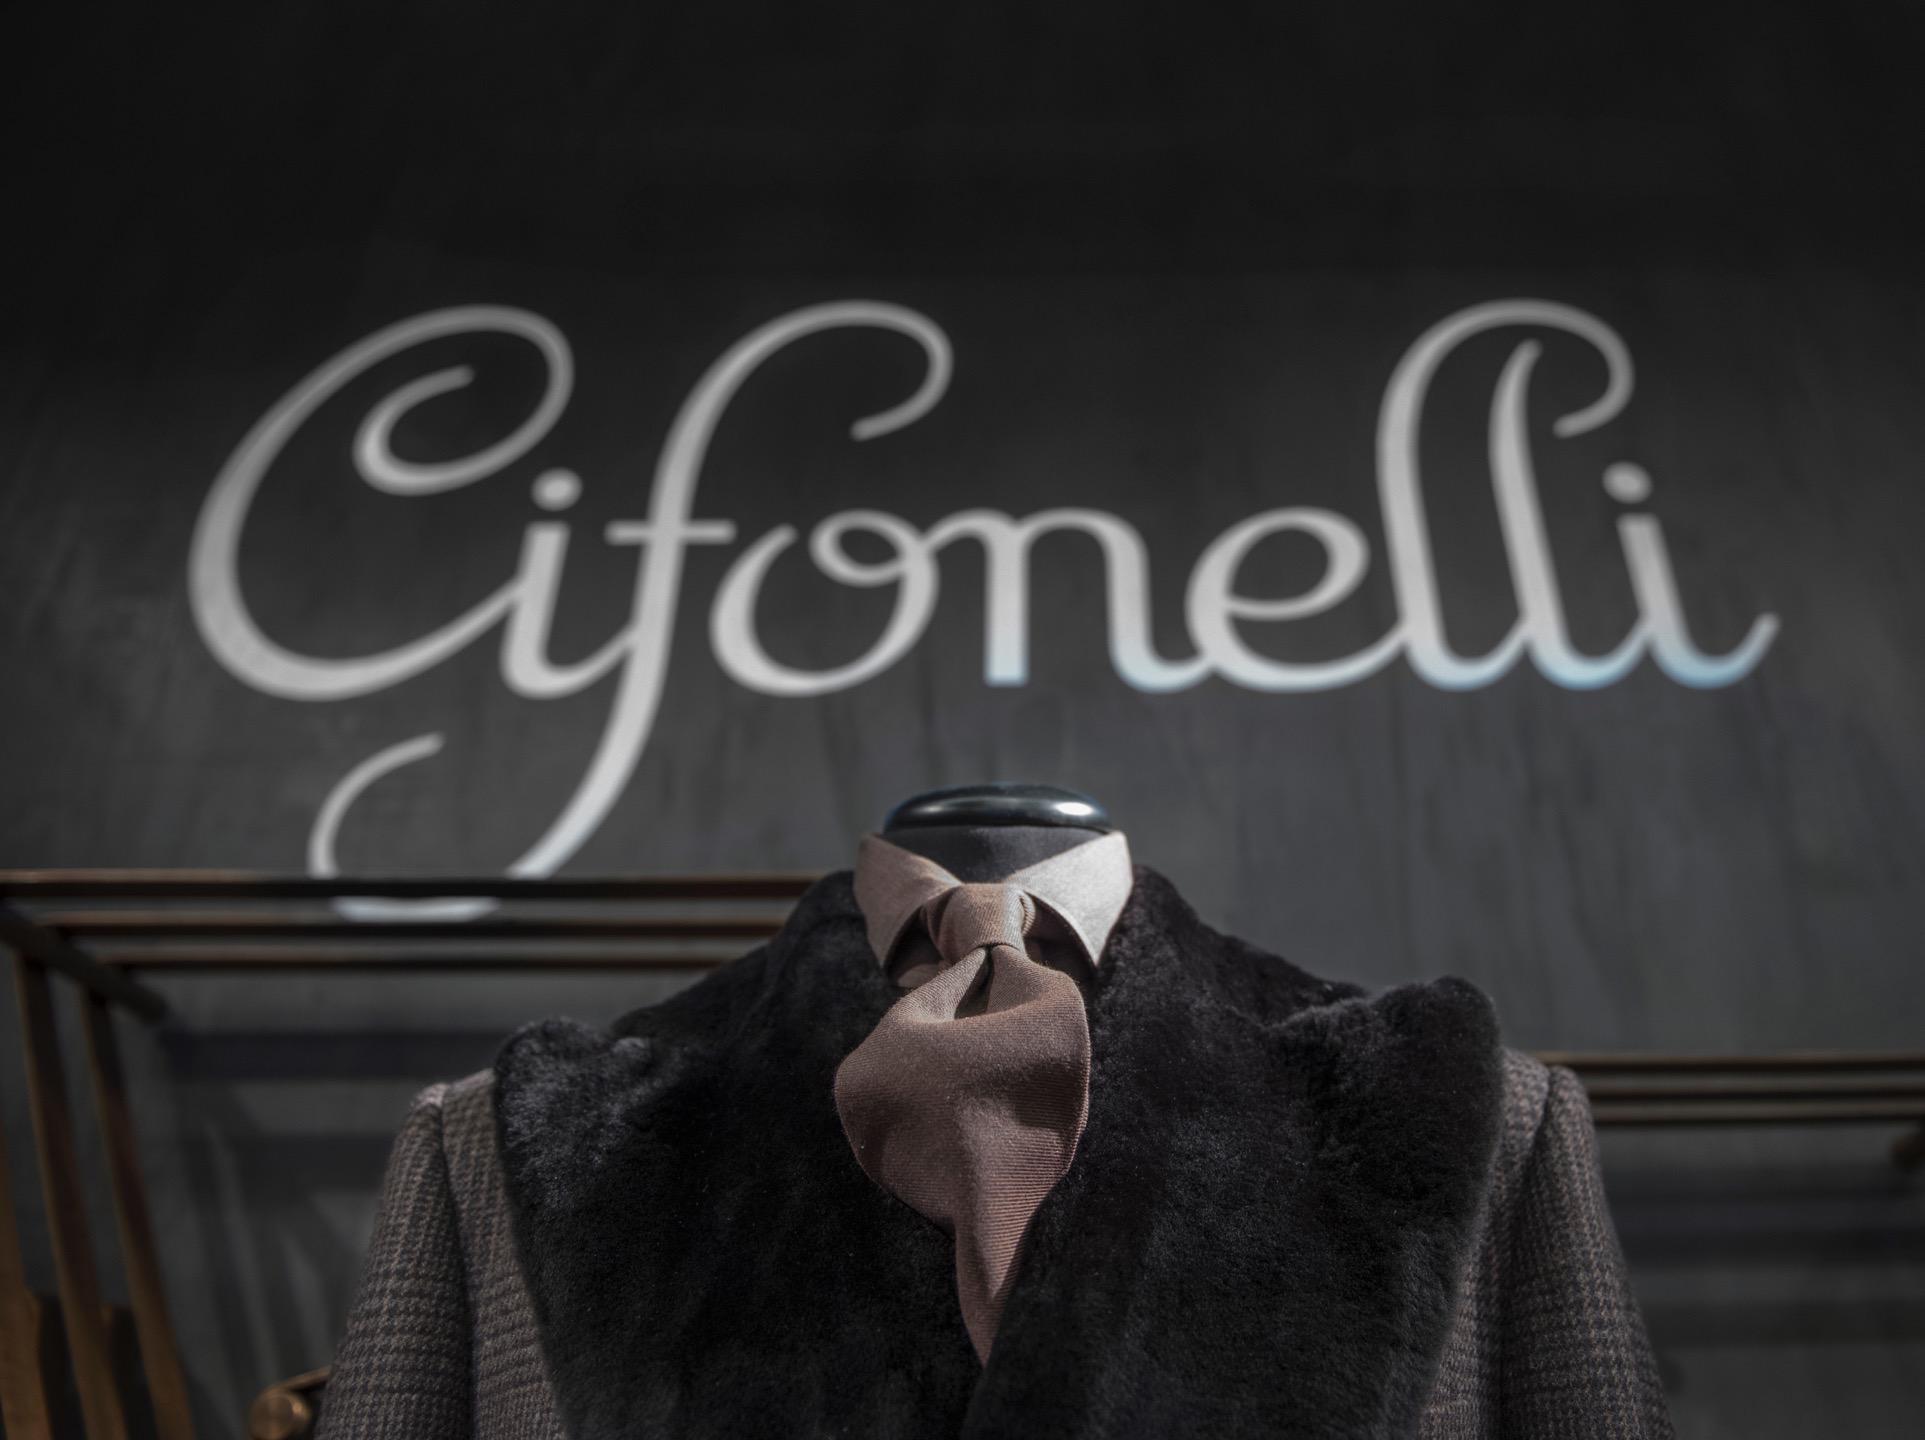 Cifonelli fall 2017 Presentation